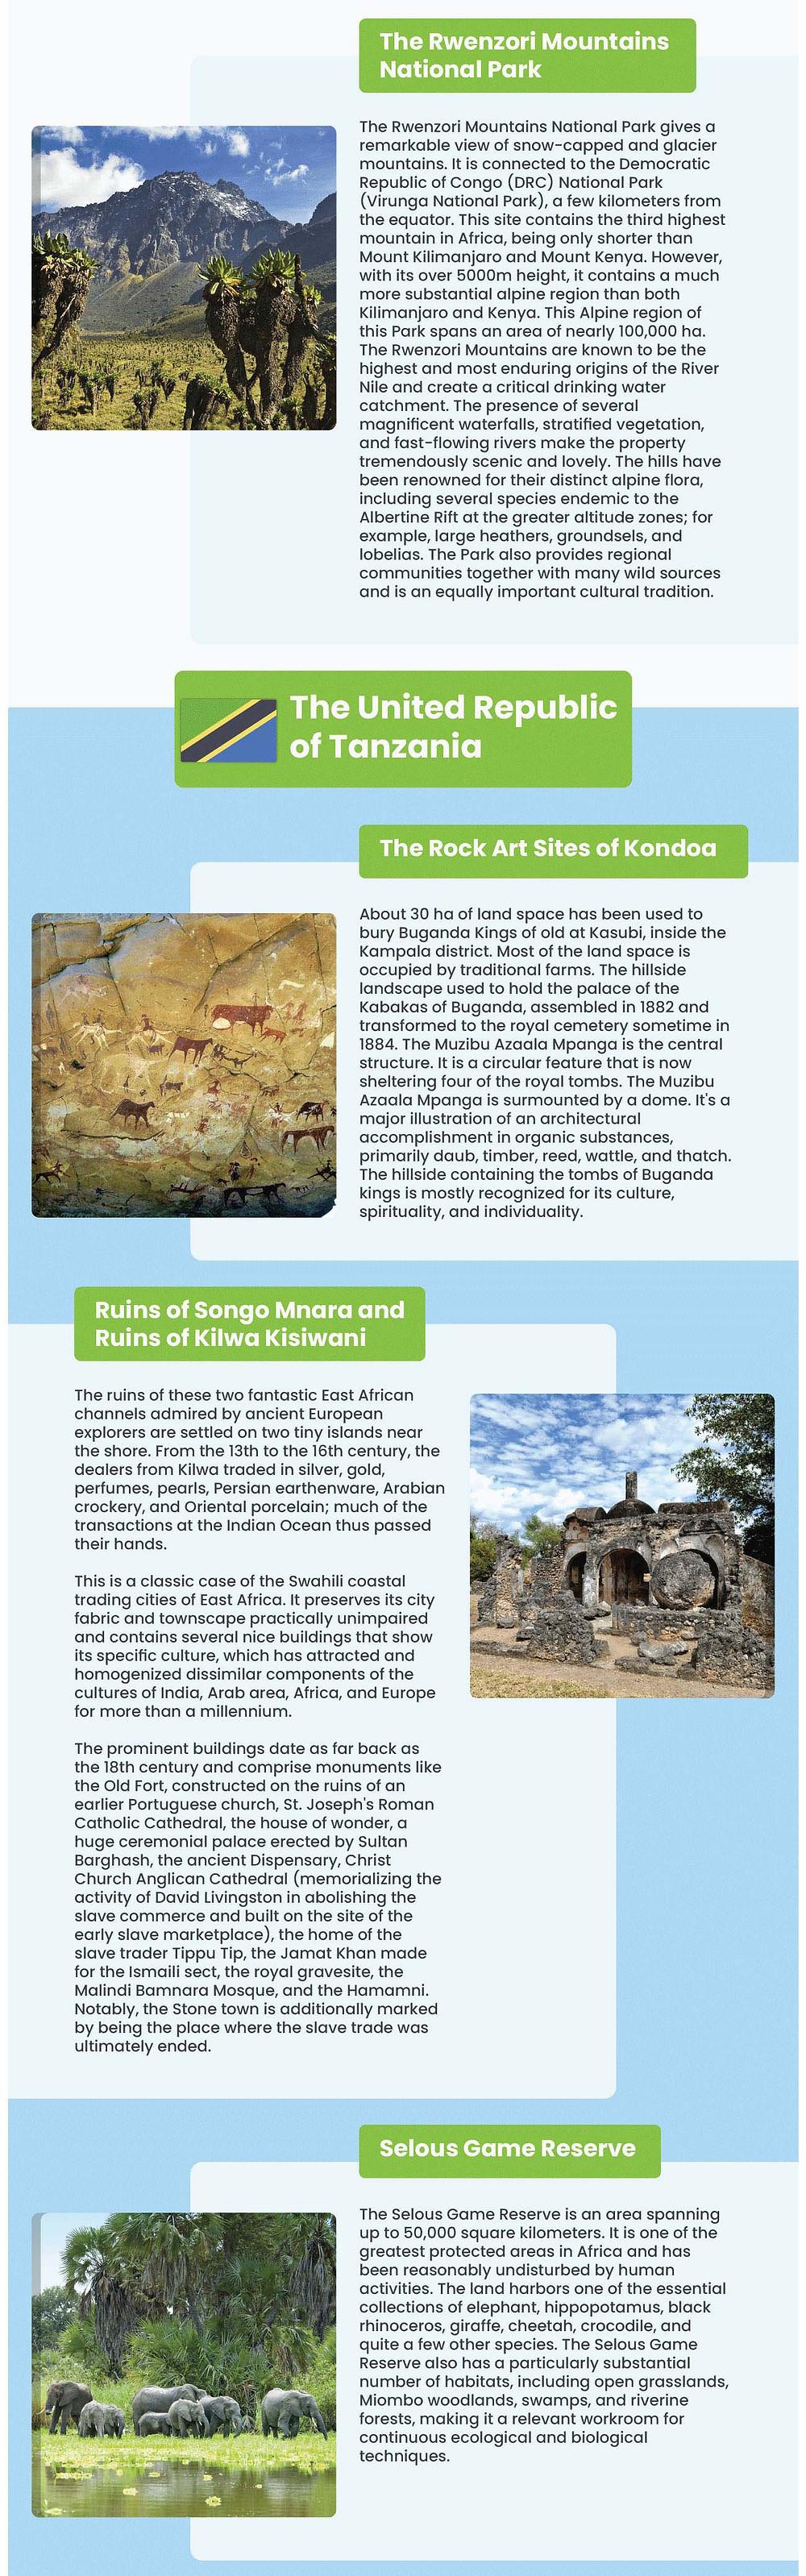 the Rwenzori mountains national park